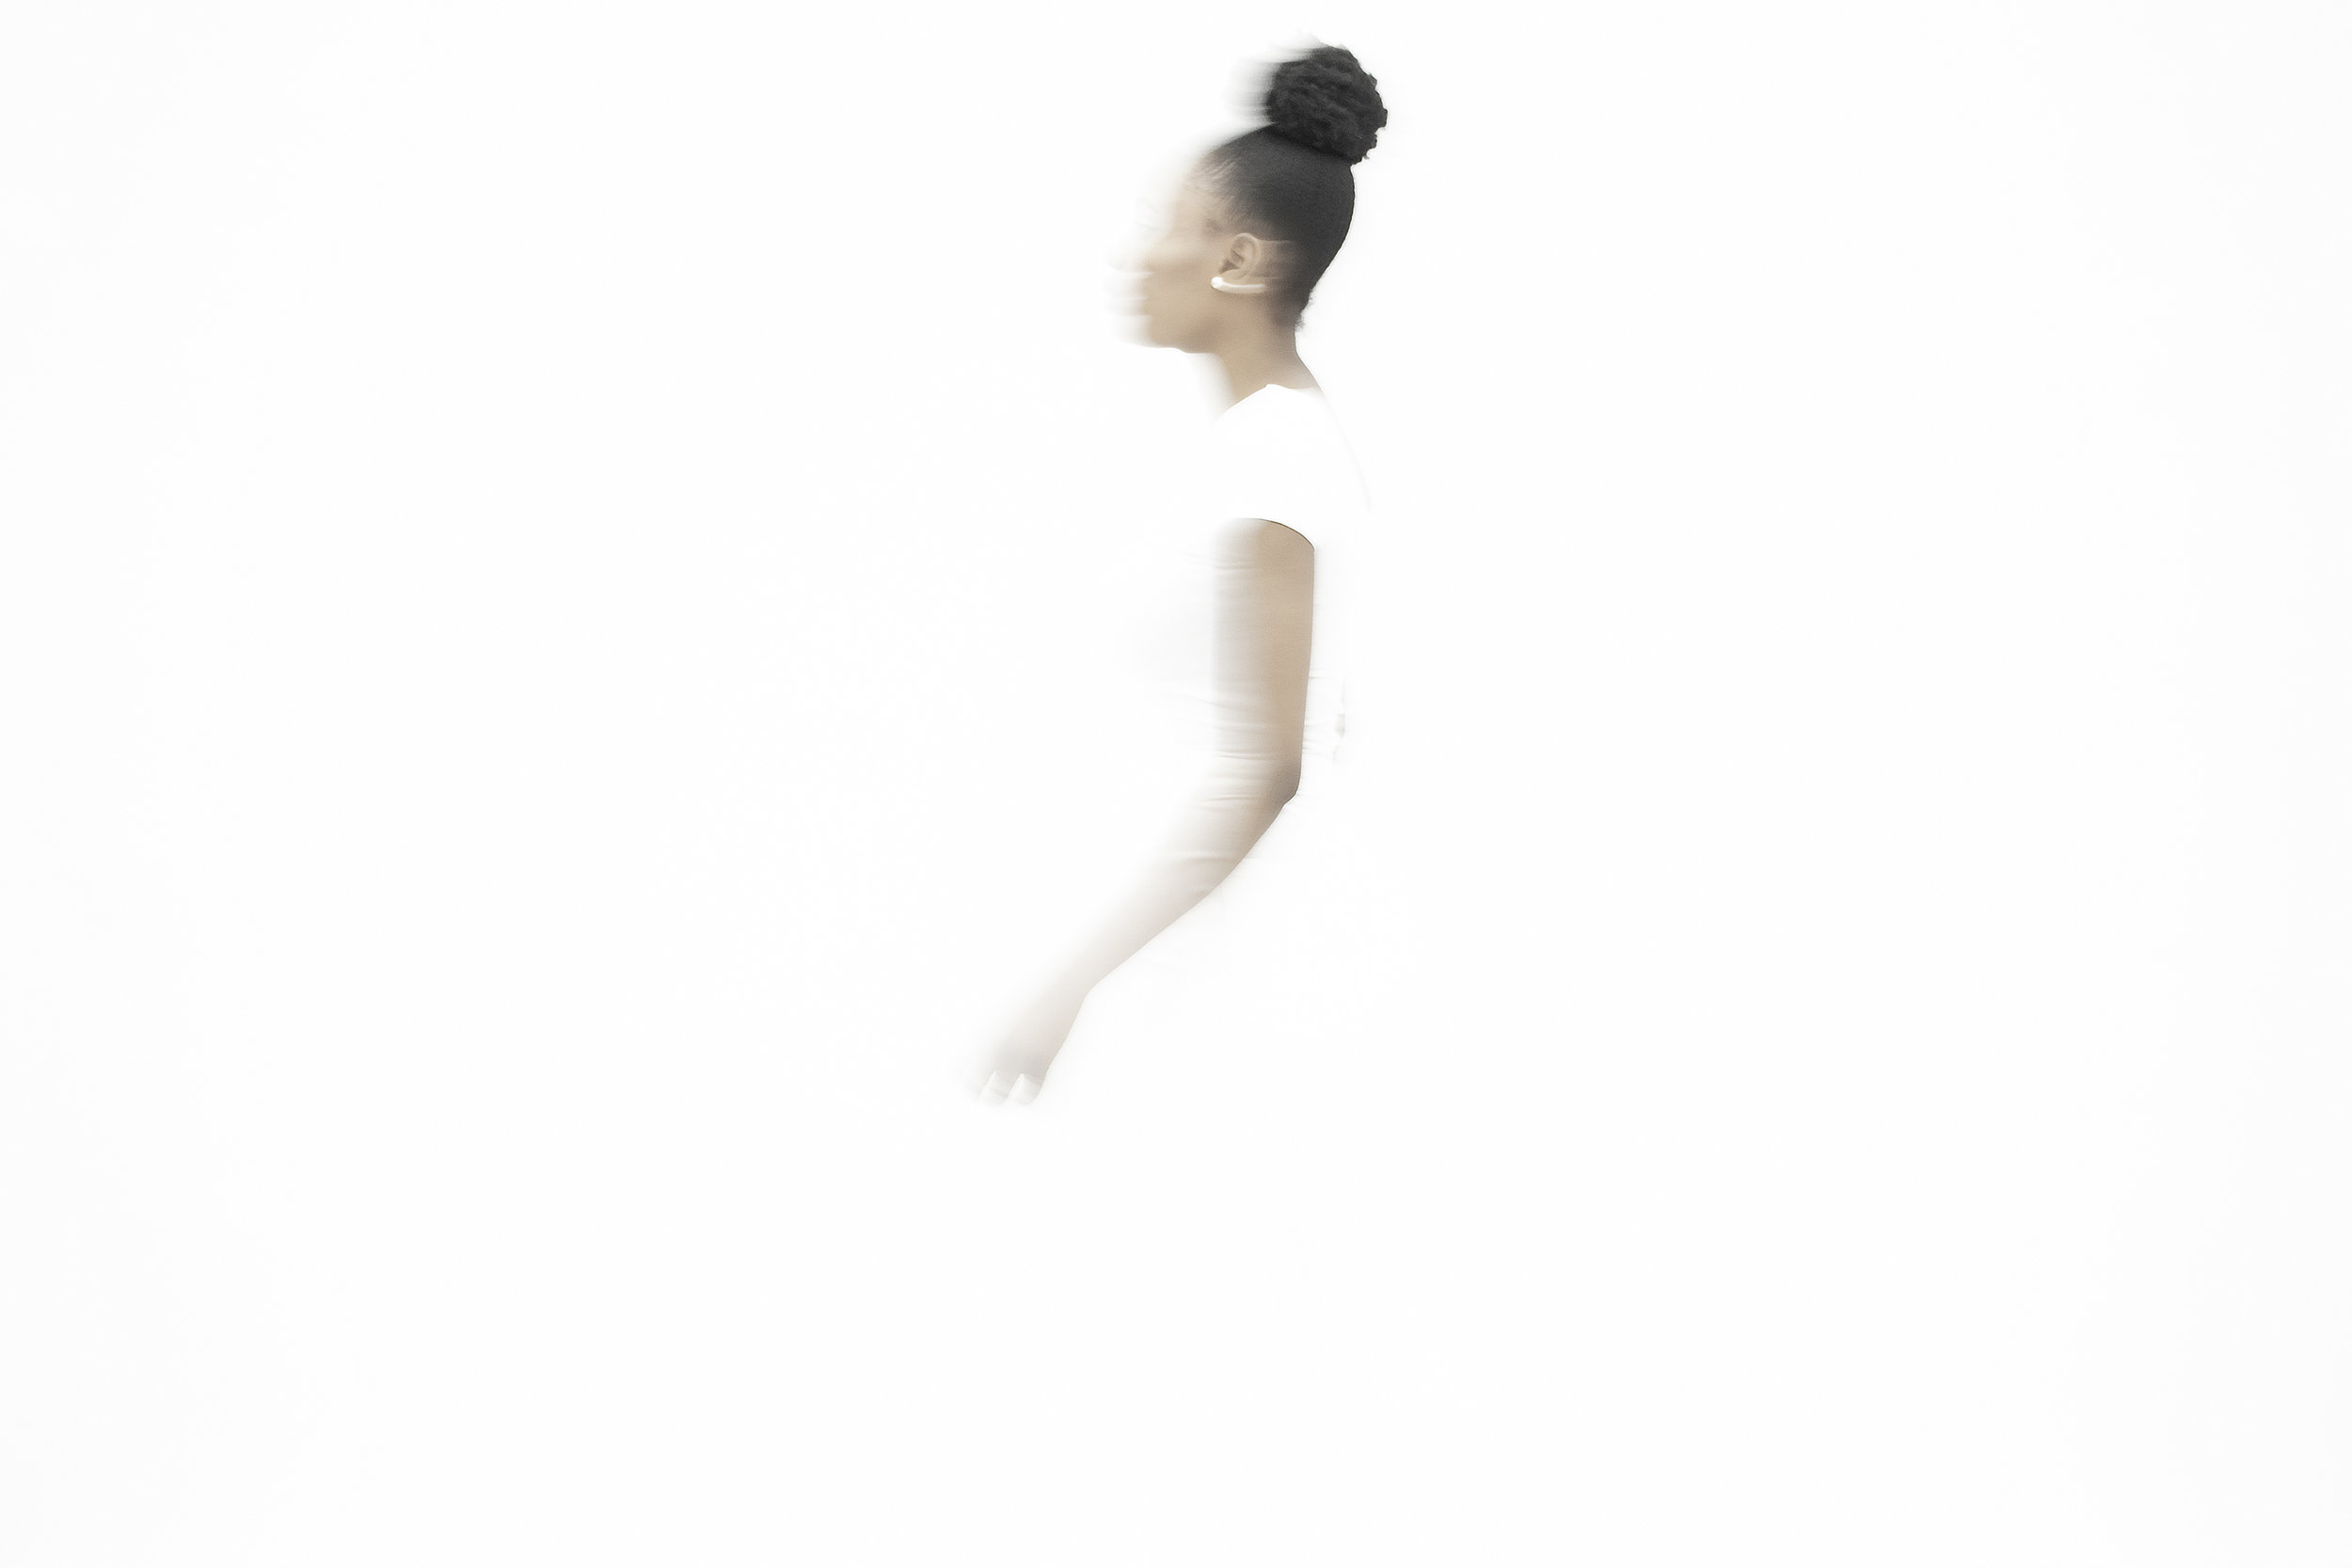 Final-Walking-Blurry-2-Print-On-A4.jpg